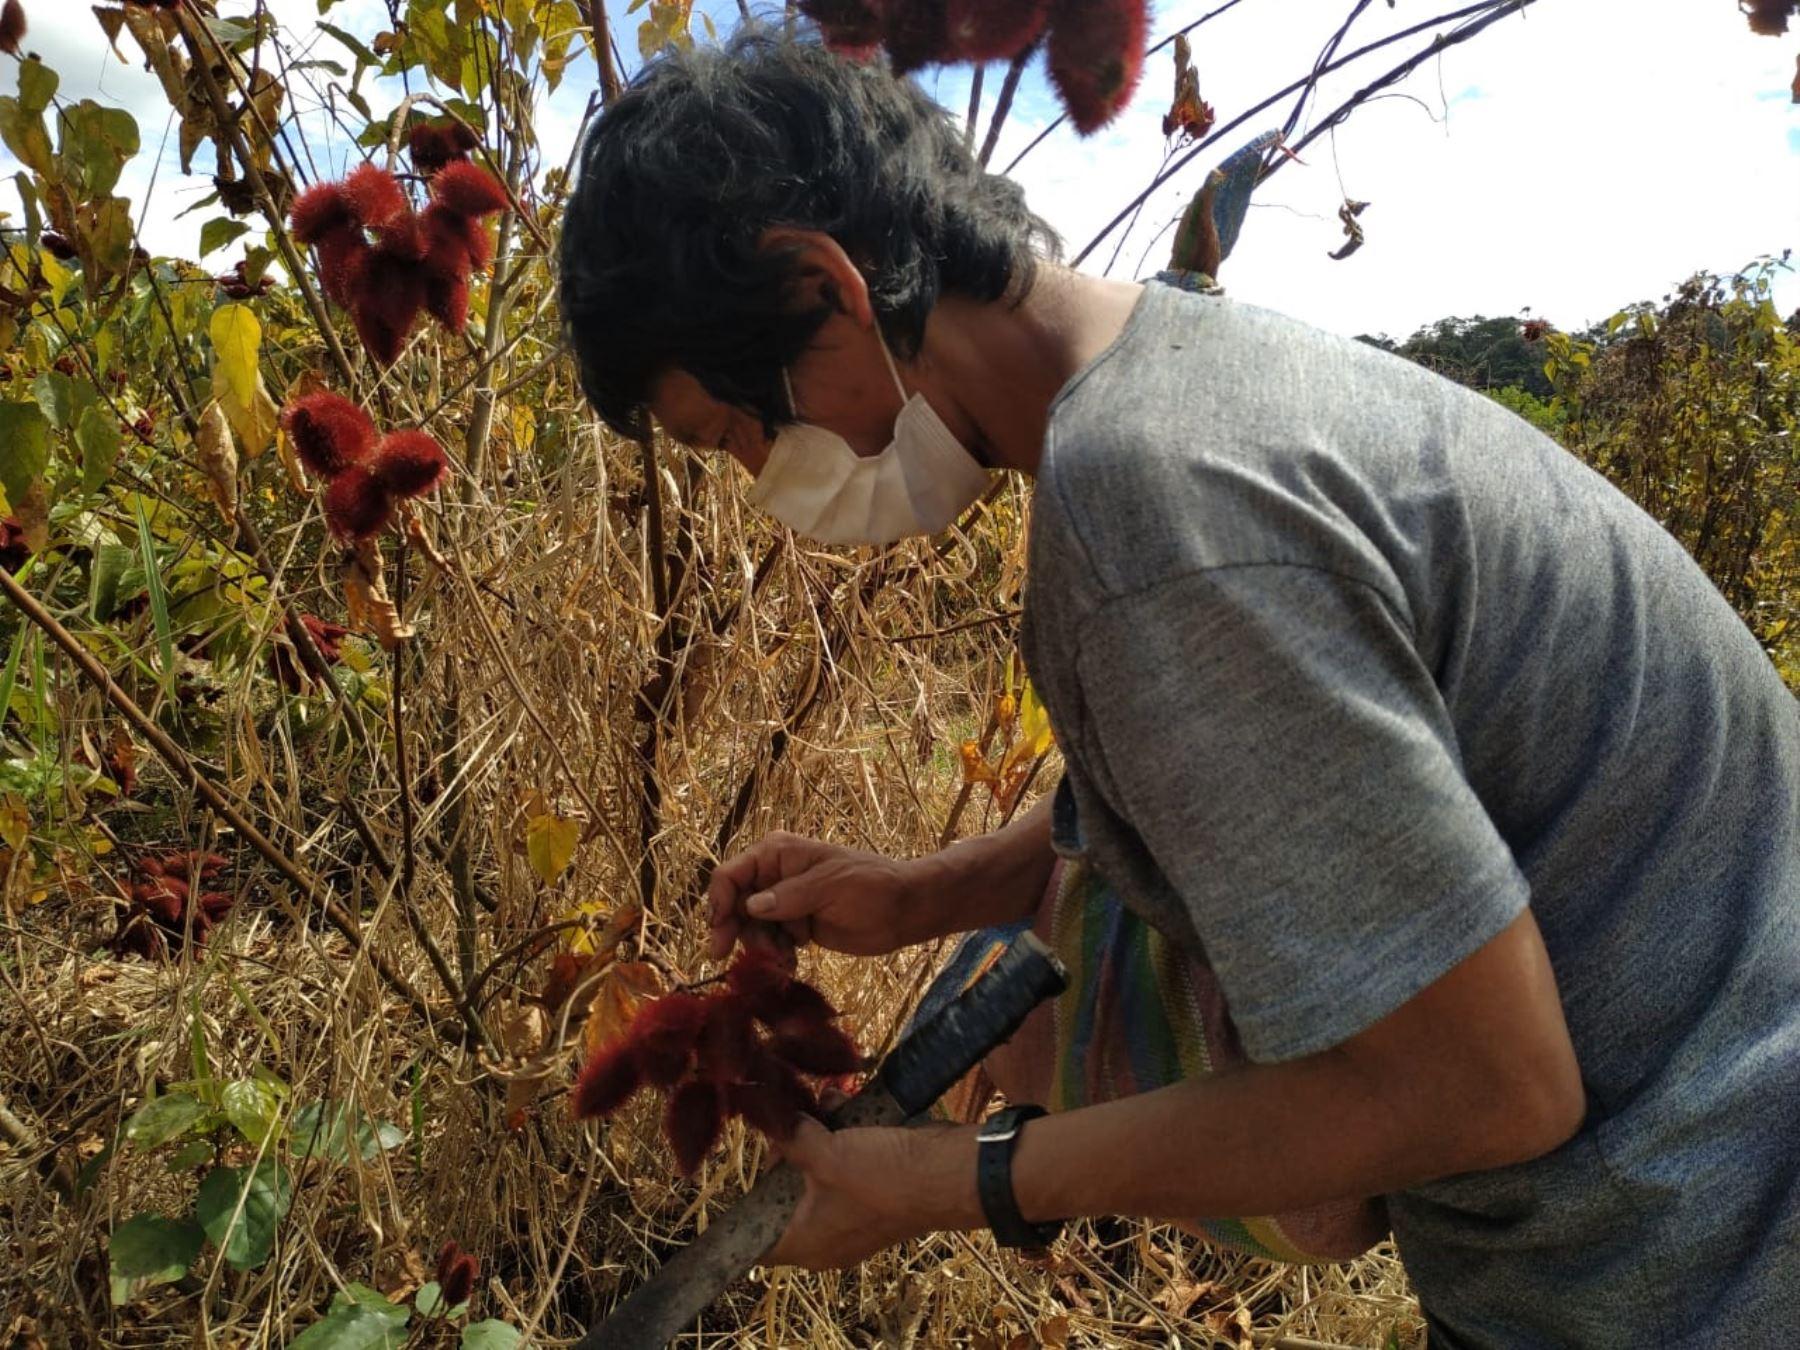 Programa PAIS del Midis entrega mascarillas a agricultores de comunidad indígena matsigenka de Cusco. ANDINA/Difusión